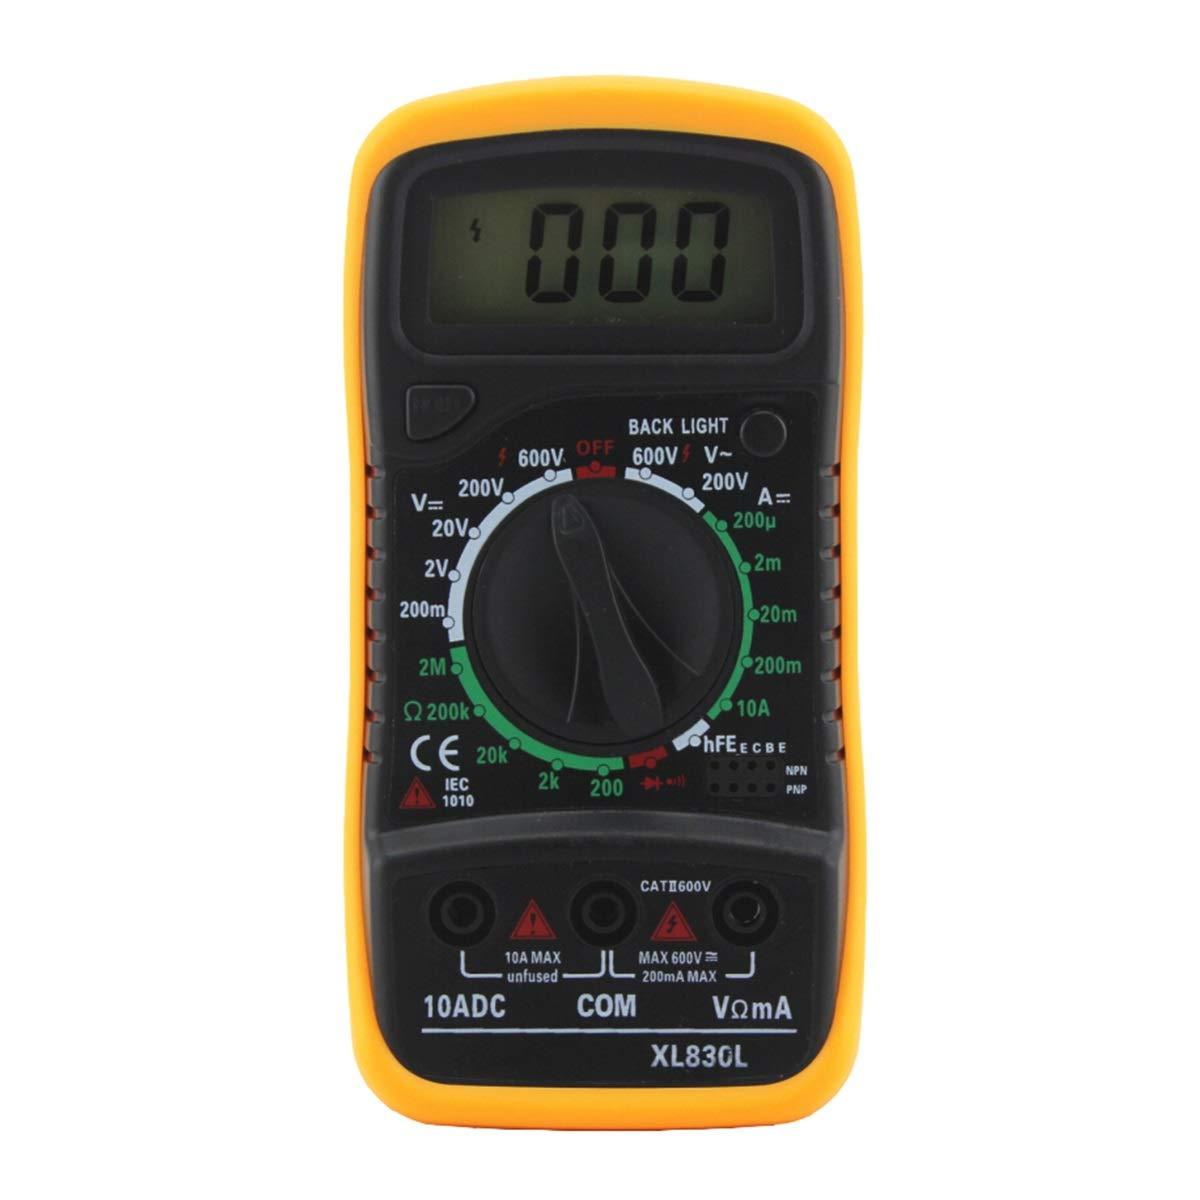 Jinxuny Mult/ímetro Digital XL830L Mult/ímetro Retroiluminaci/ón LCD Digital Mult/ímetro Volt/ímetro Amper/ímetro AC DC Ohm Volt Tester Medidor de medici/ón de Corriente de Prueba Color : Green